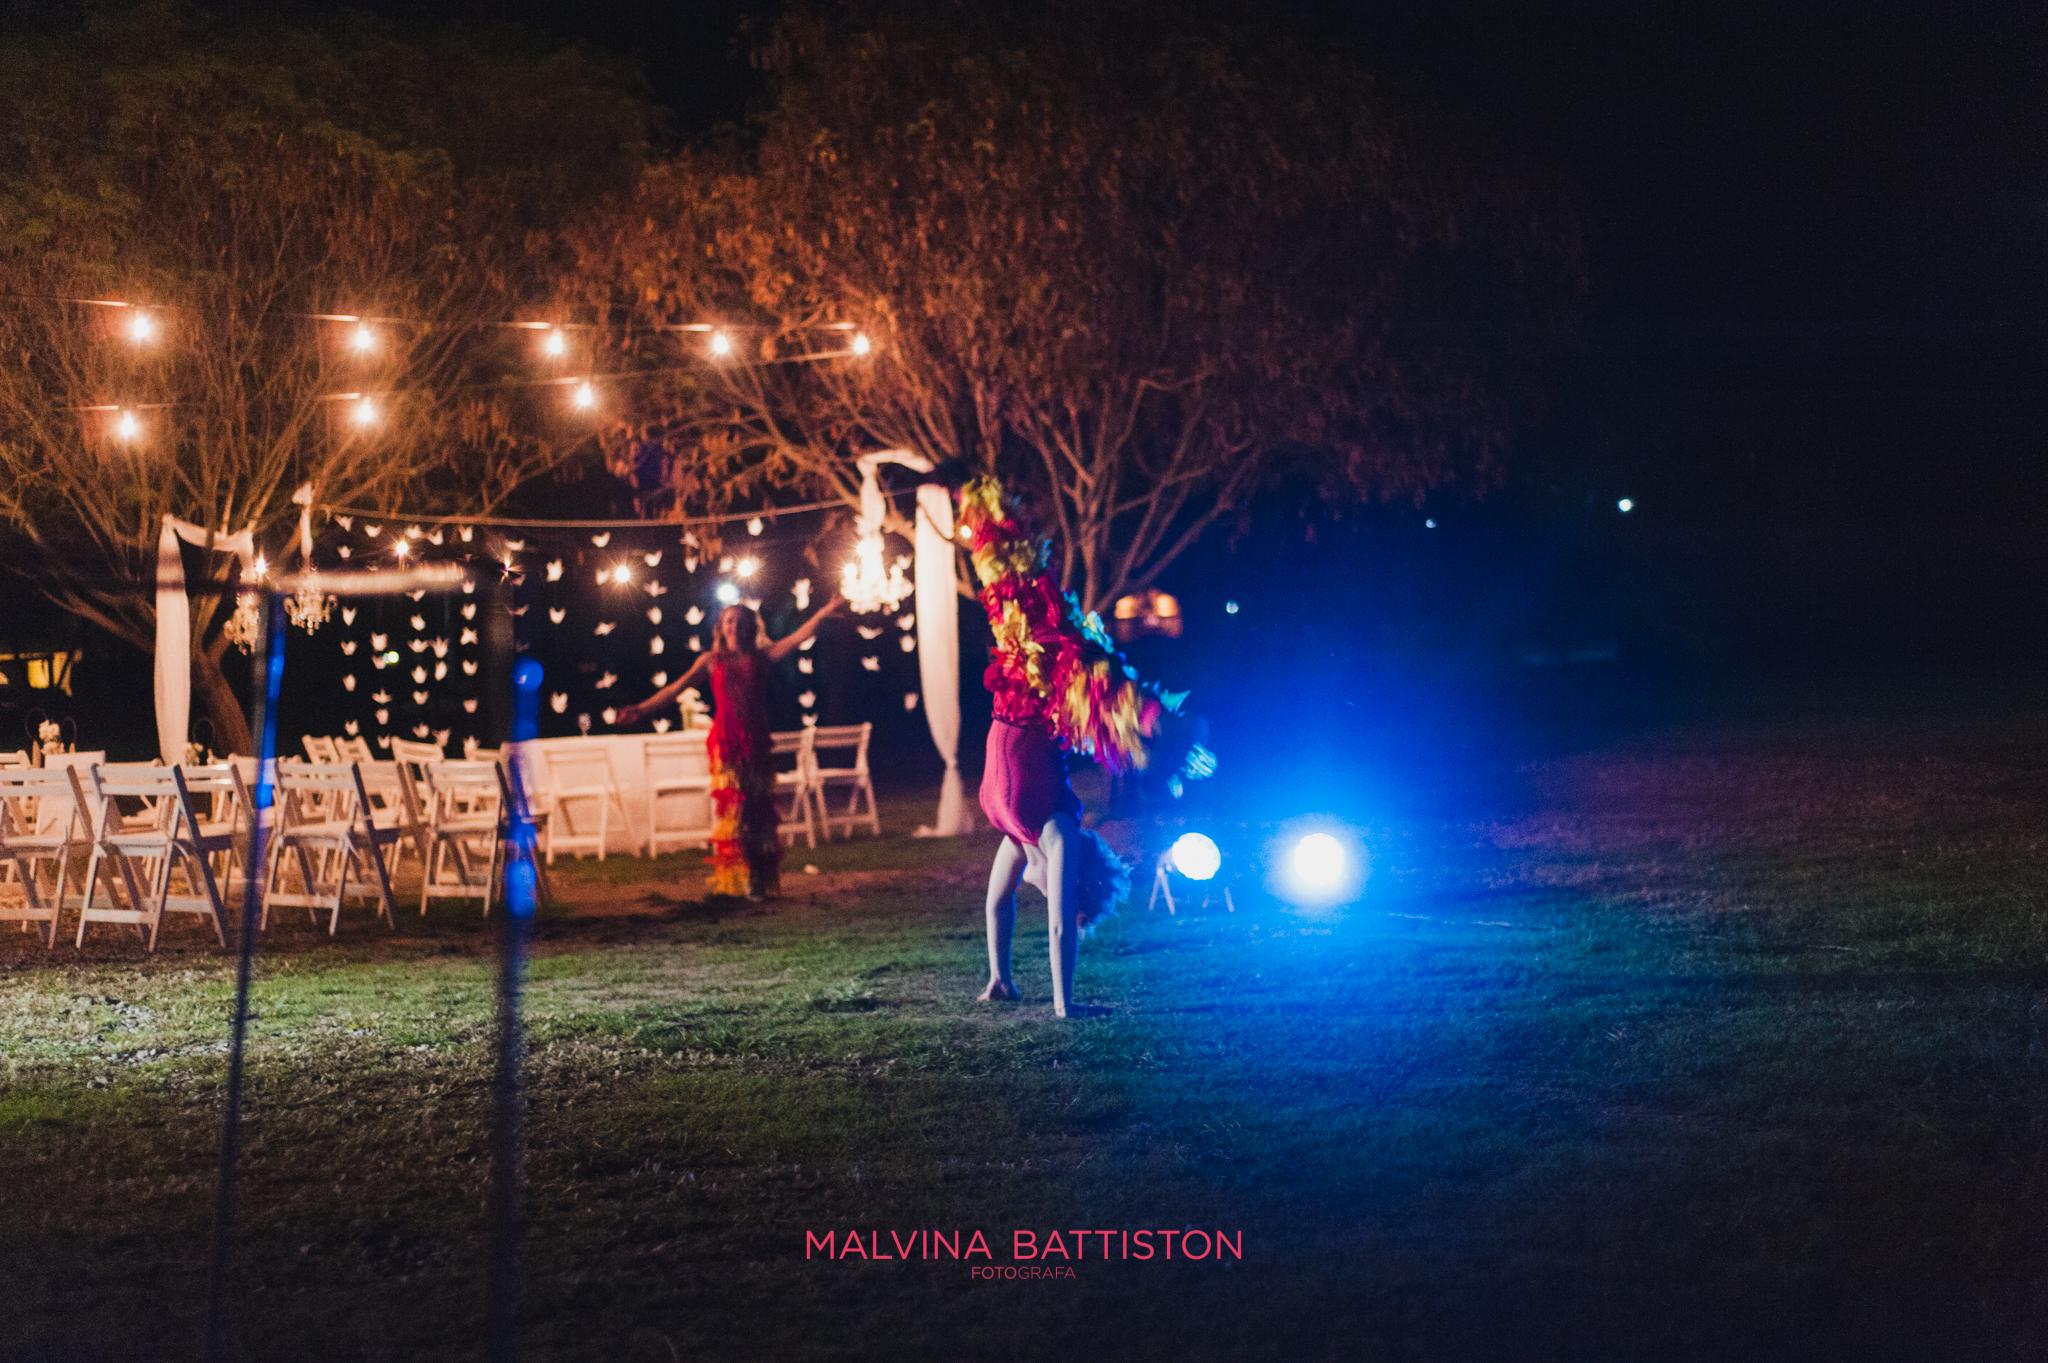 www.malvinabattiston (35).jpg